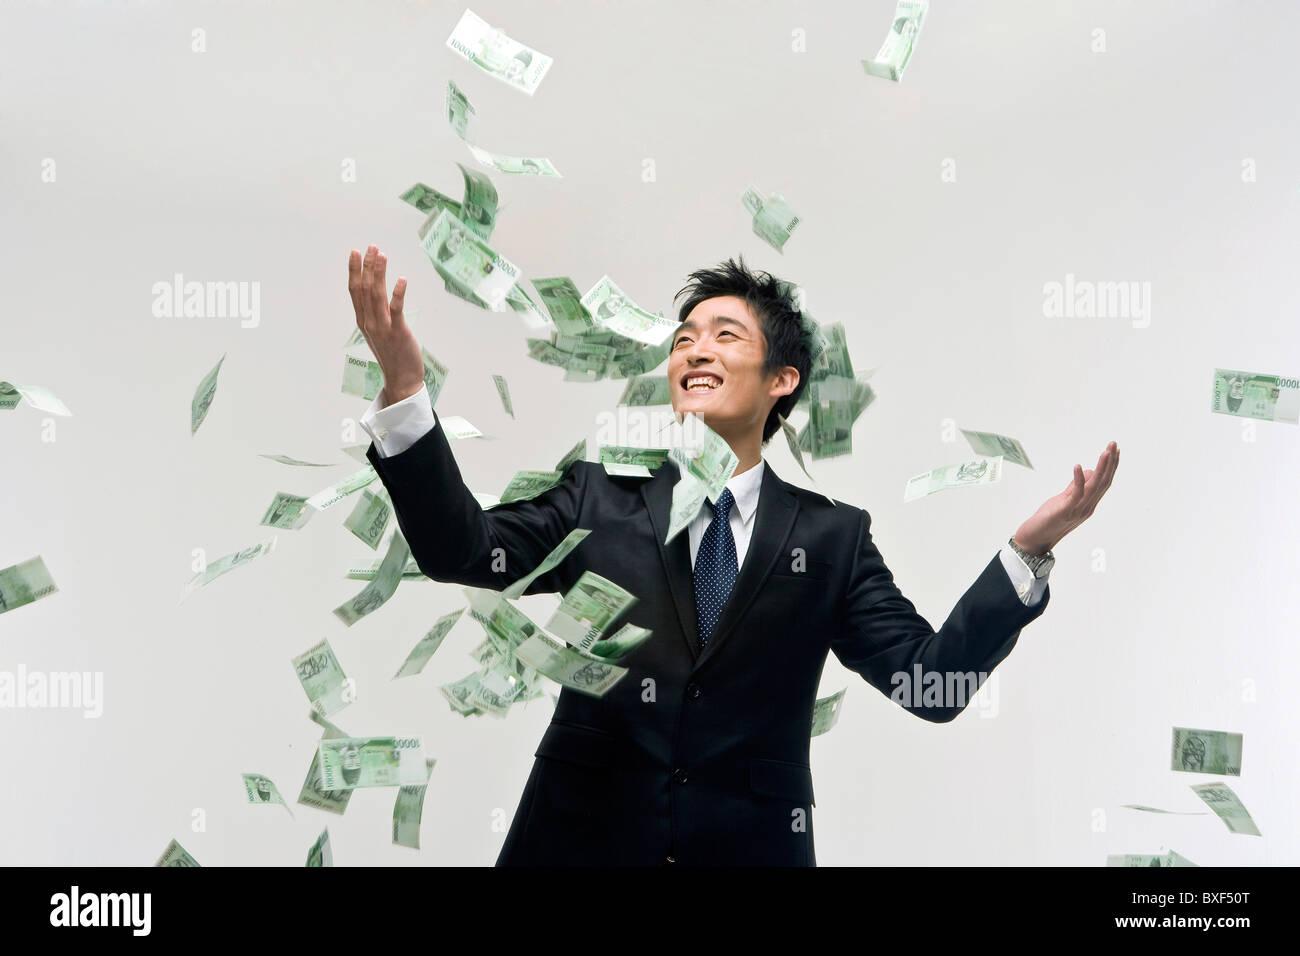 Money Raining Down On Businessman Stock Photo 33524648 Alamy